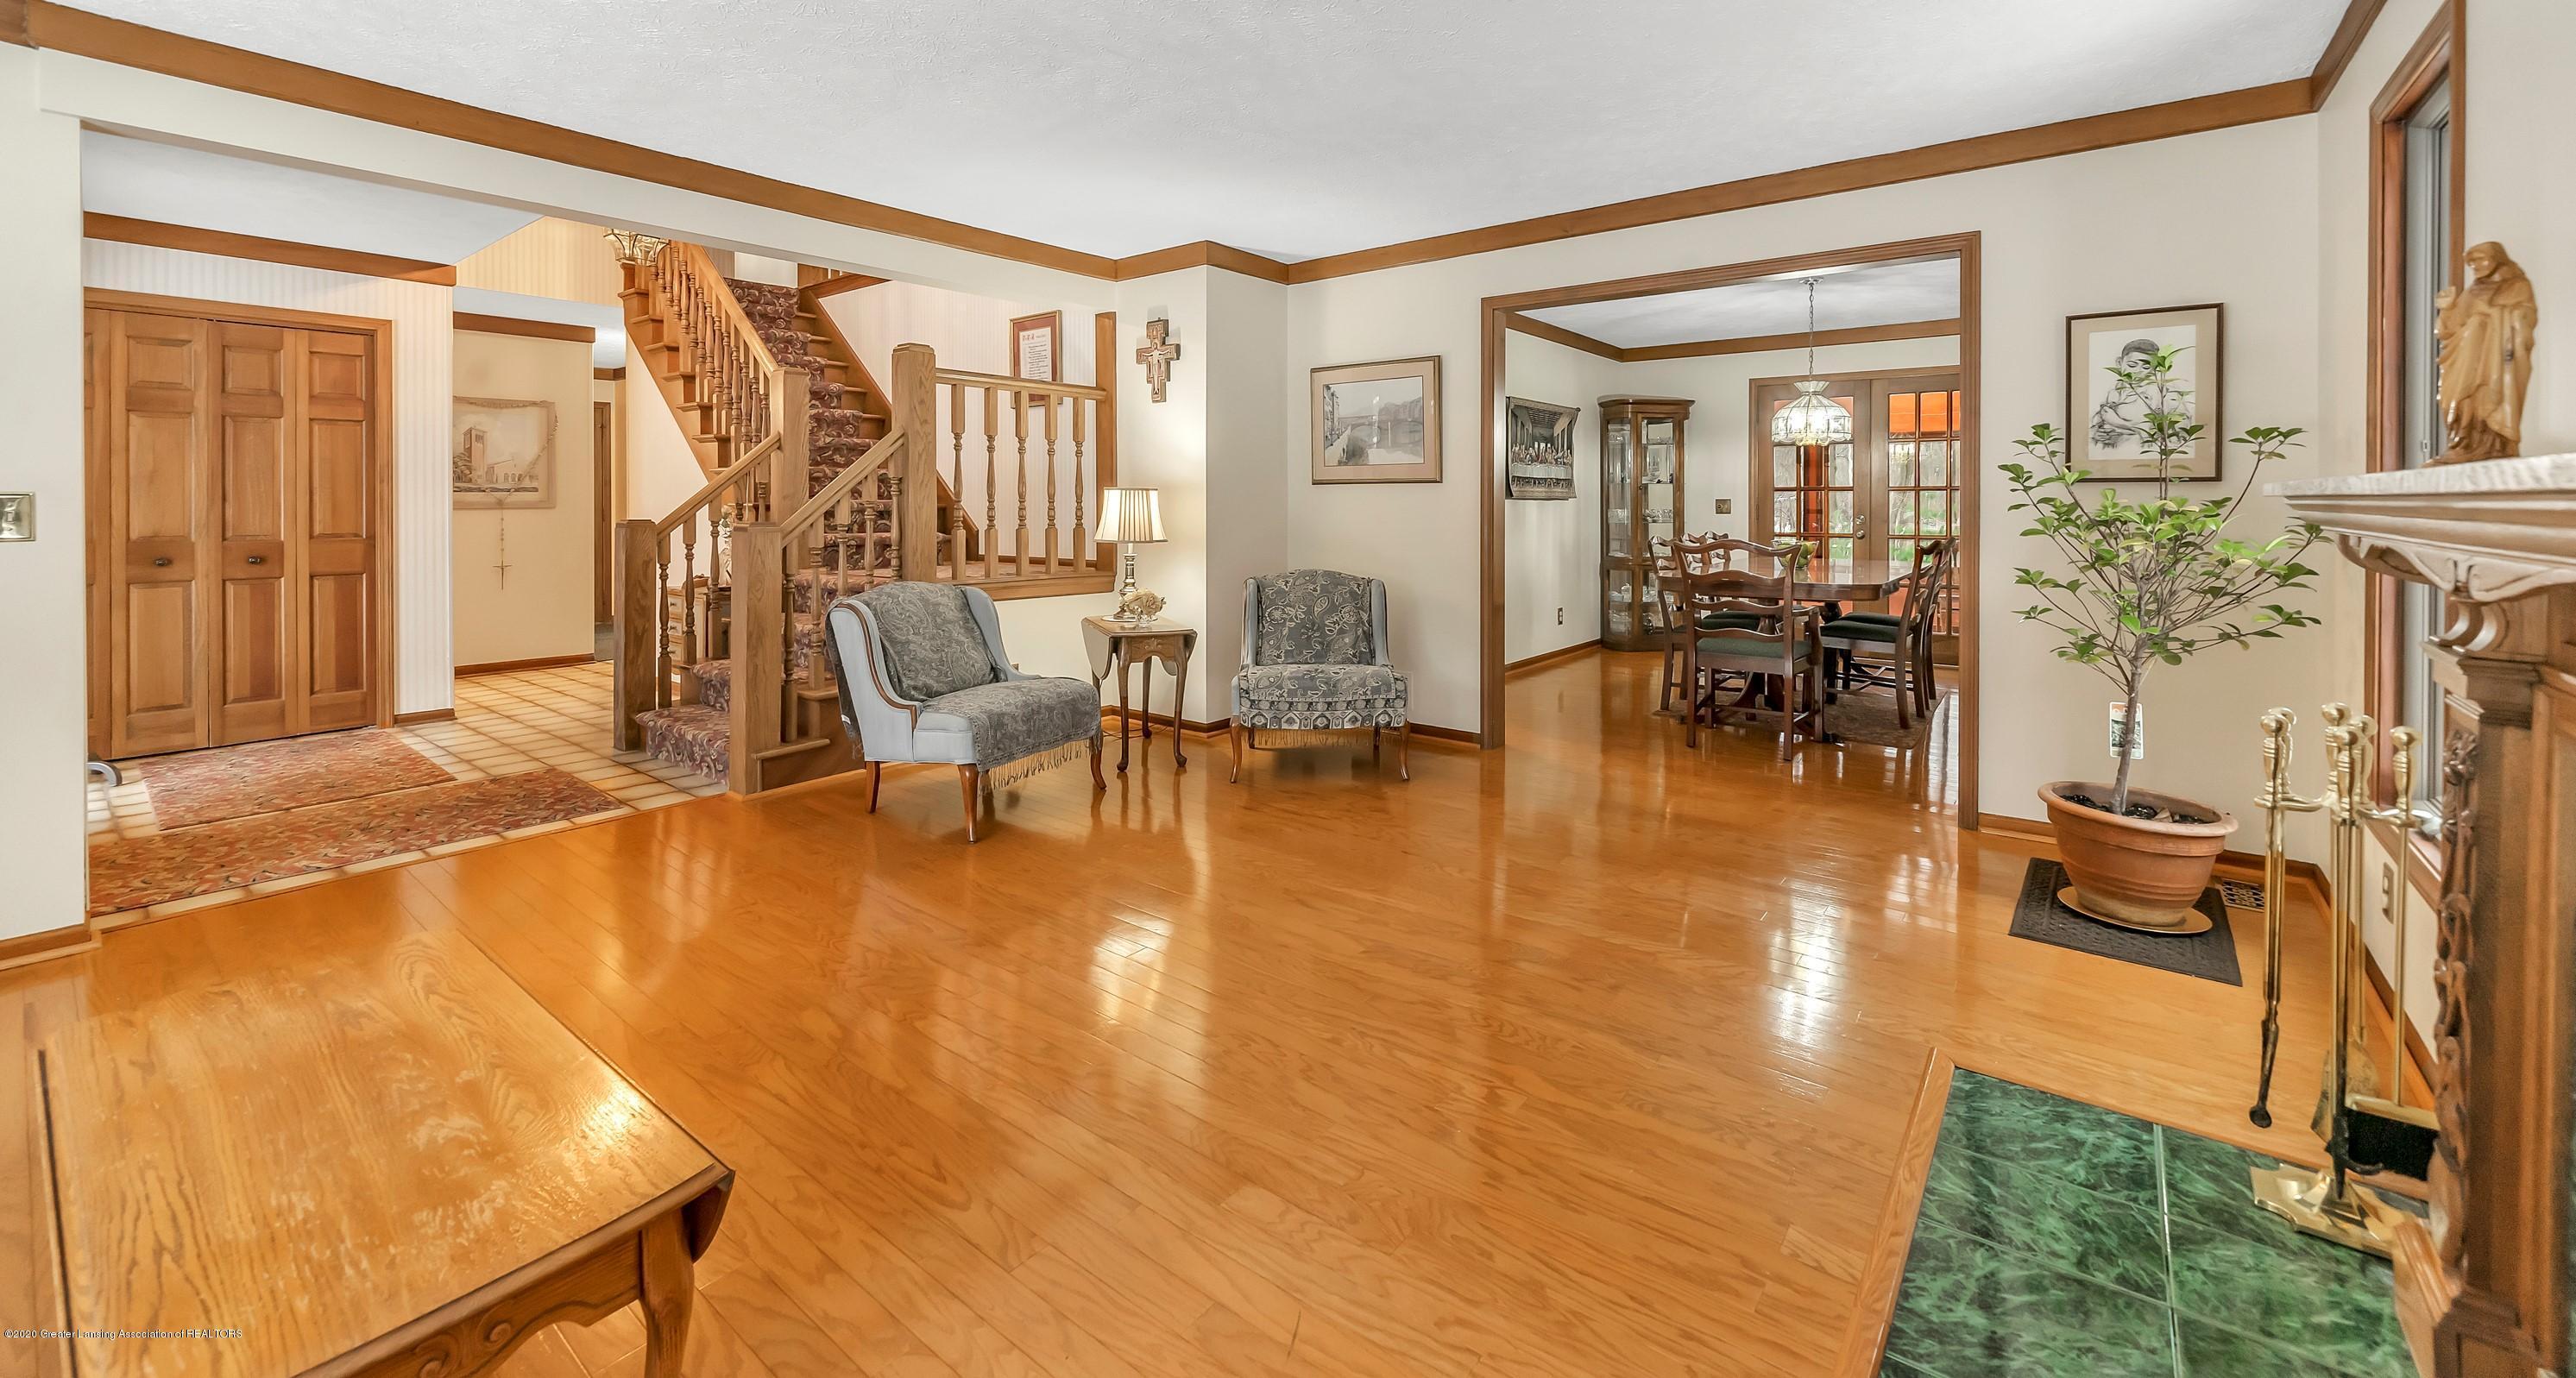 248 E Newman Rd - living room - 15